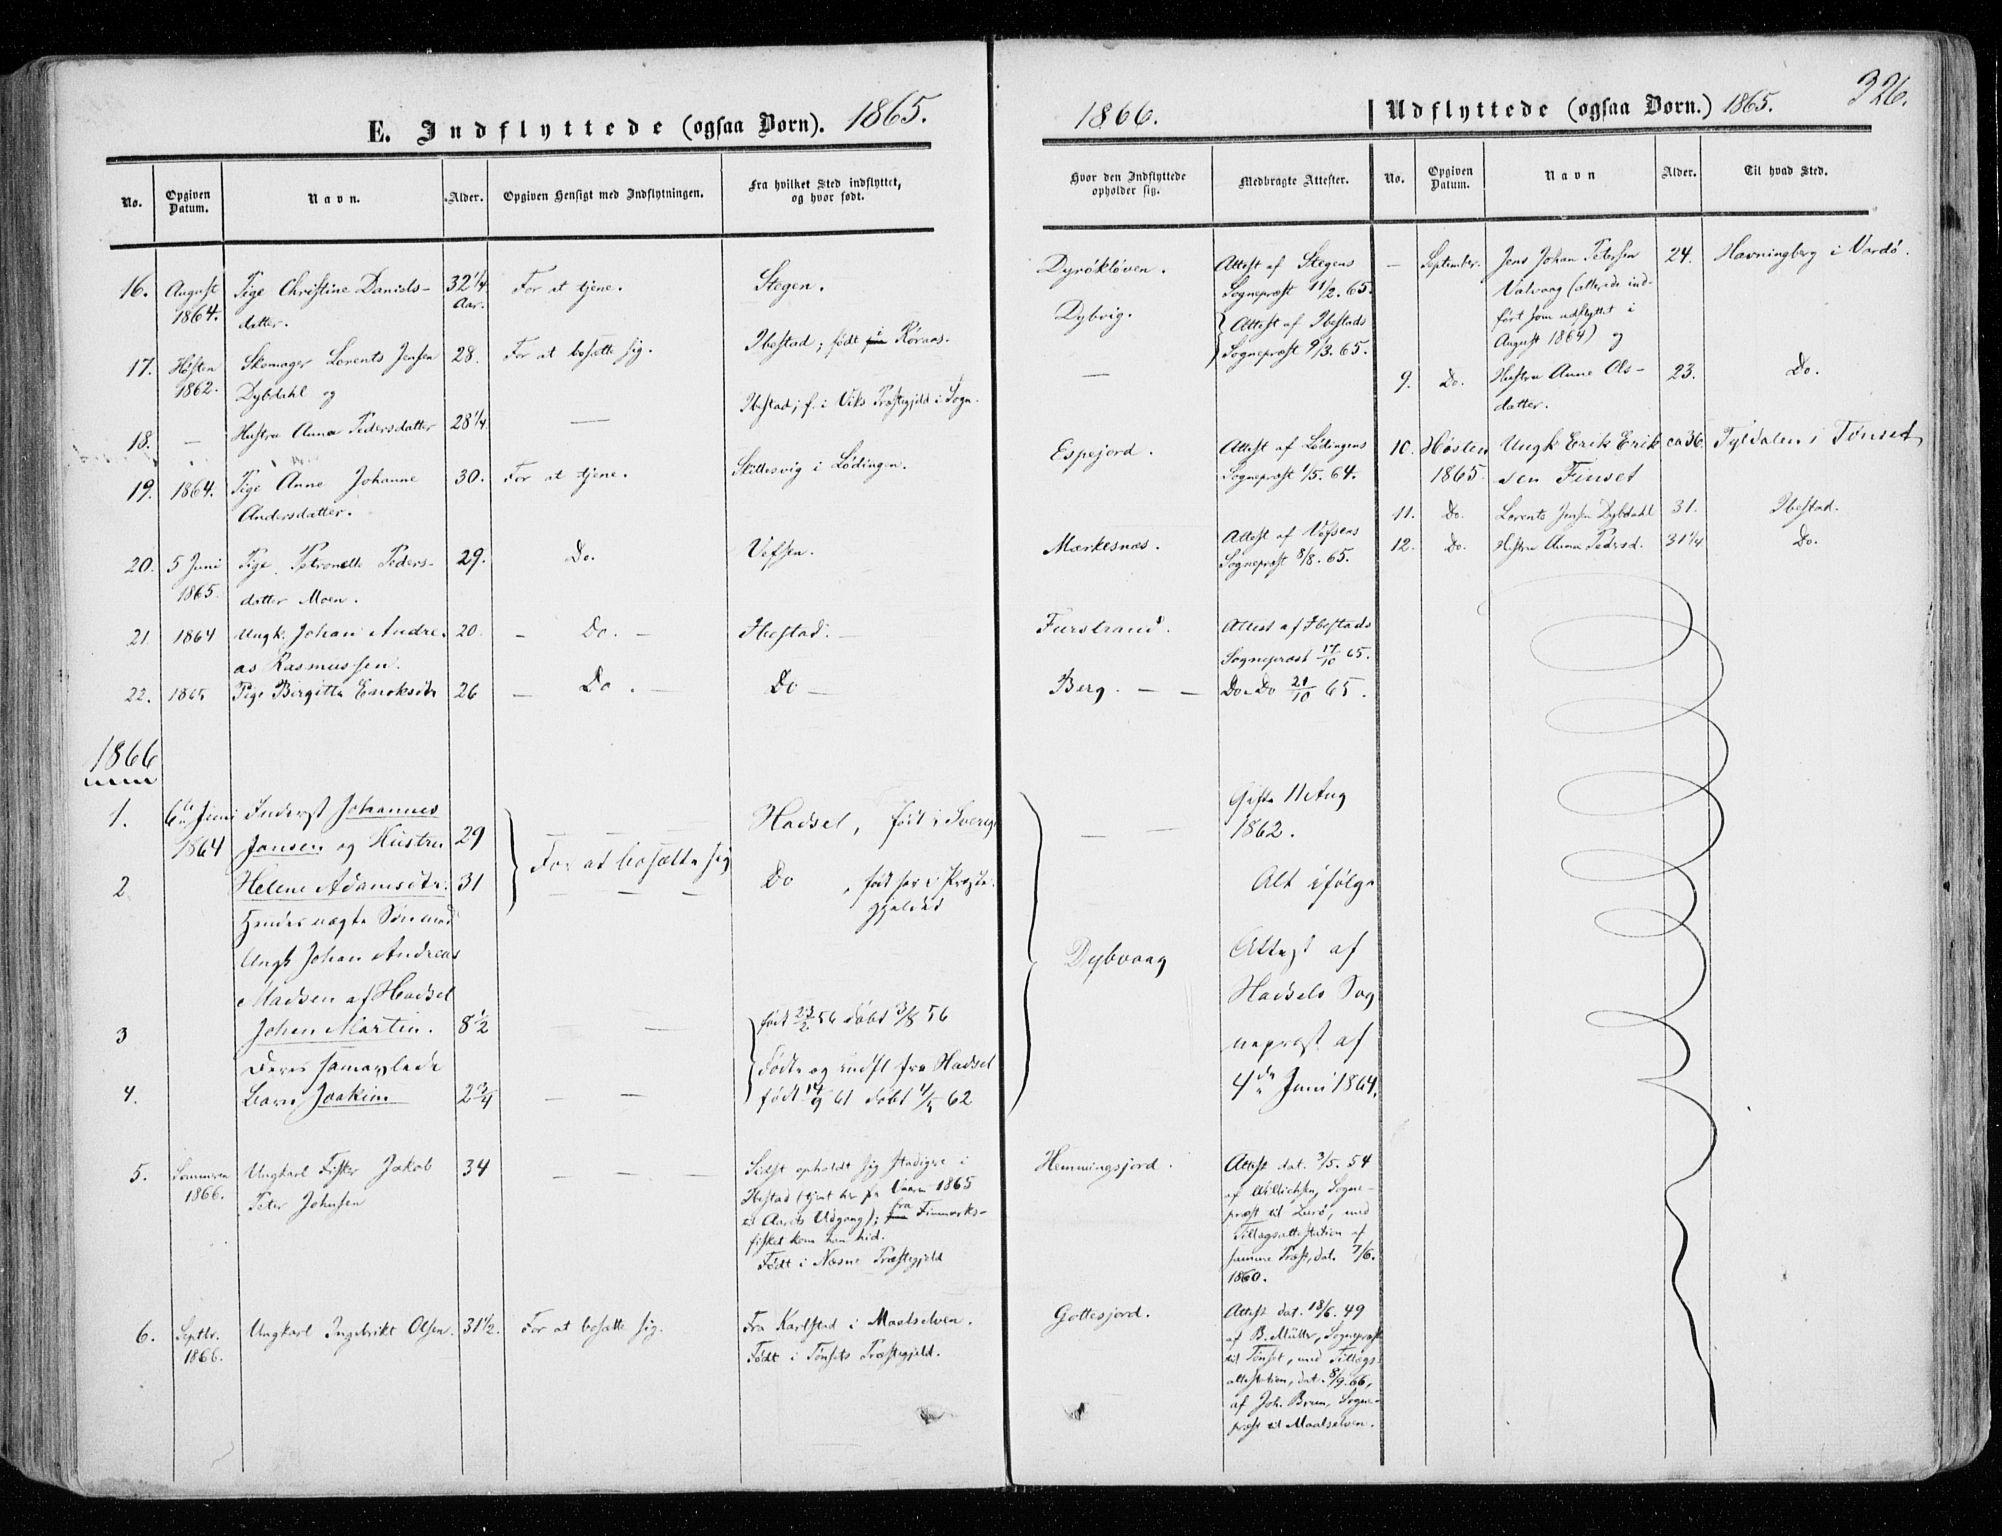 SATØ, Tranøy sokneprestkontor, I/Ia/Iaa/L0007kirke: Ministerialbok nr. 7, 1856-1866, s. 326